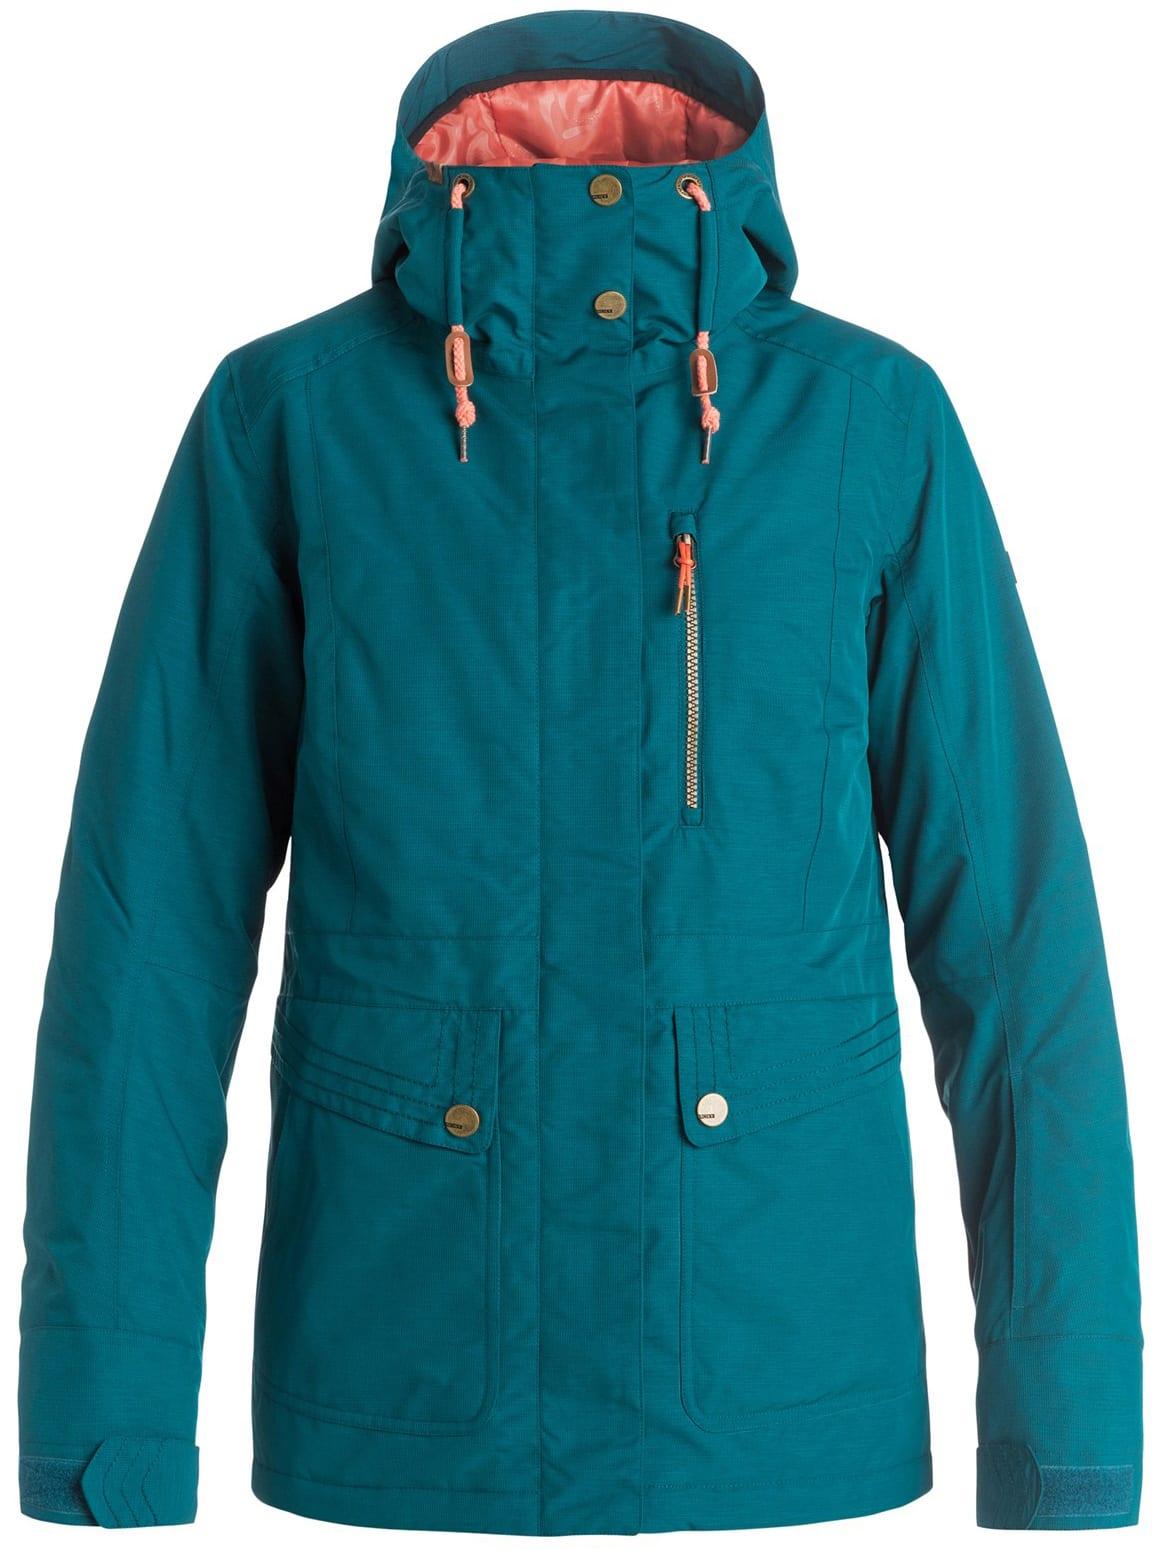 Womens snow jackets sale